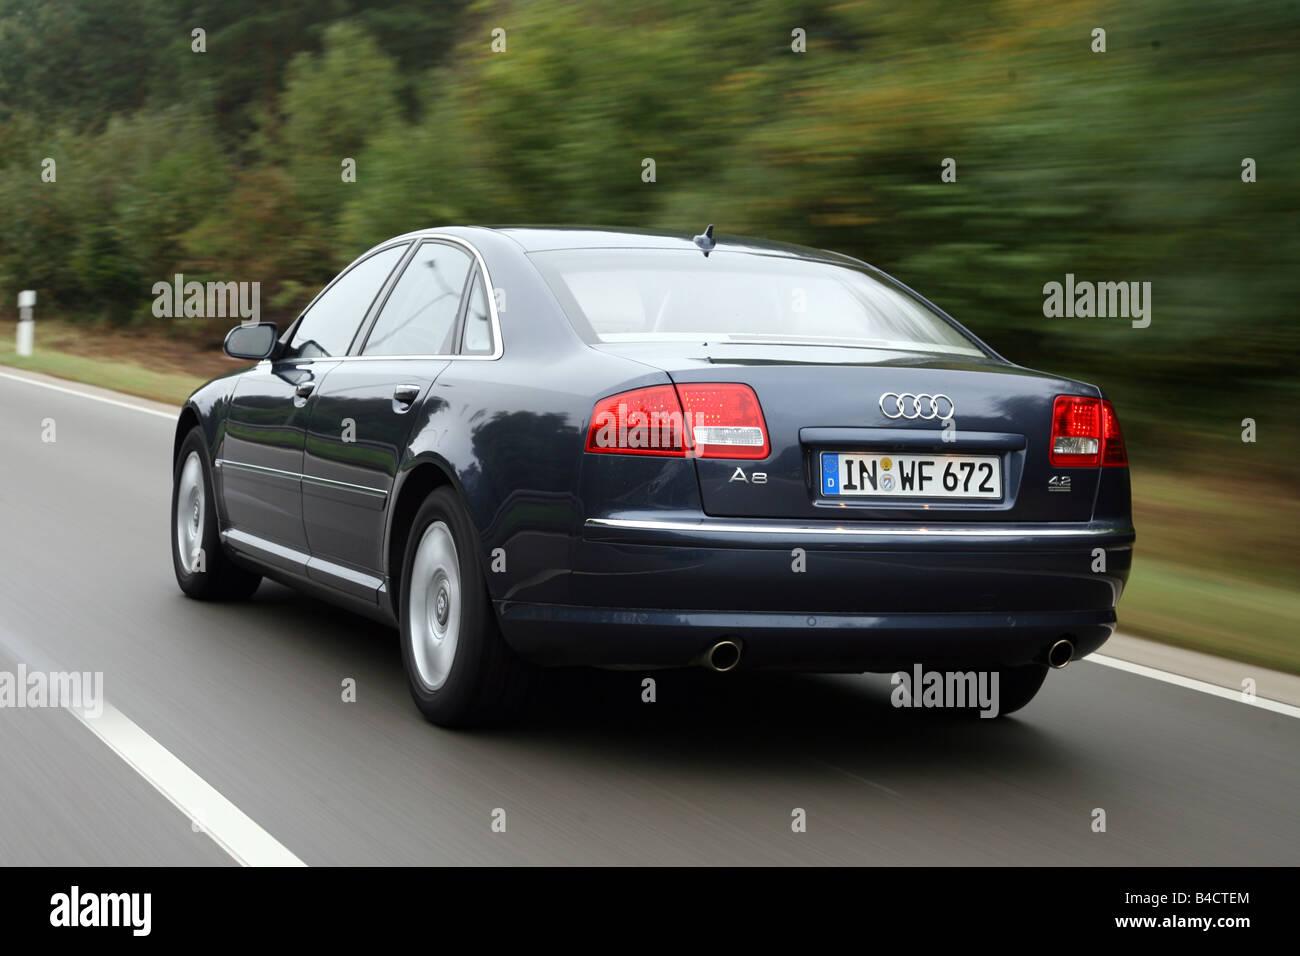 Audi a8 4 2 fsi quattro model year 2006 blue moving diagonal from